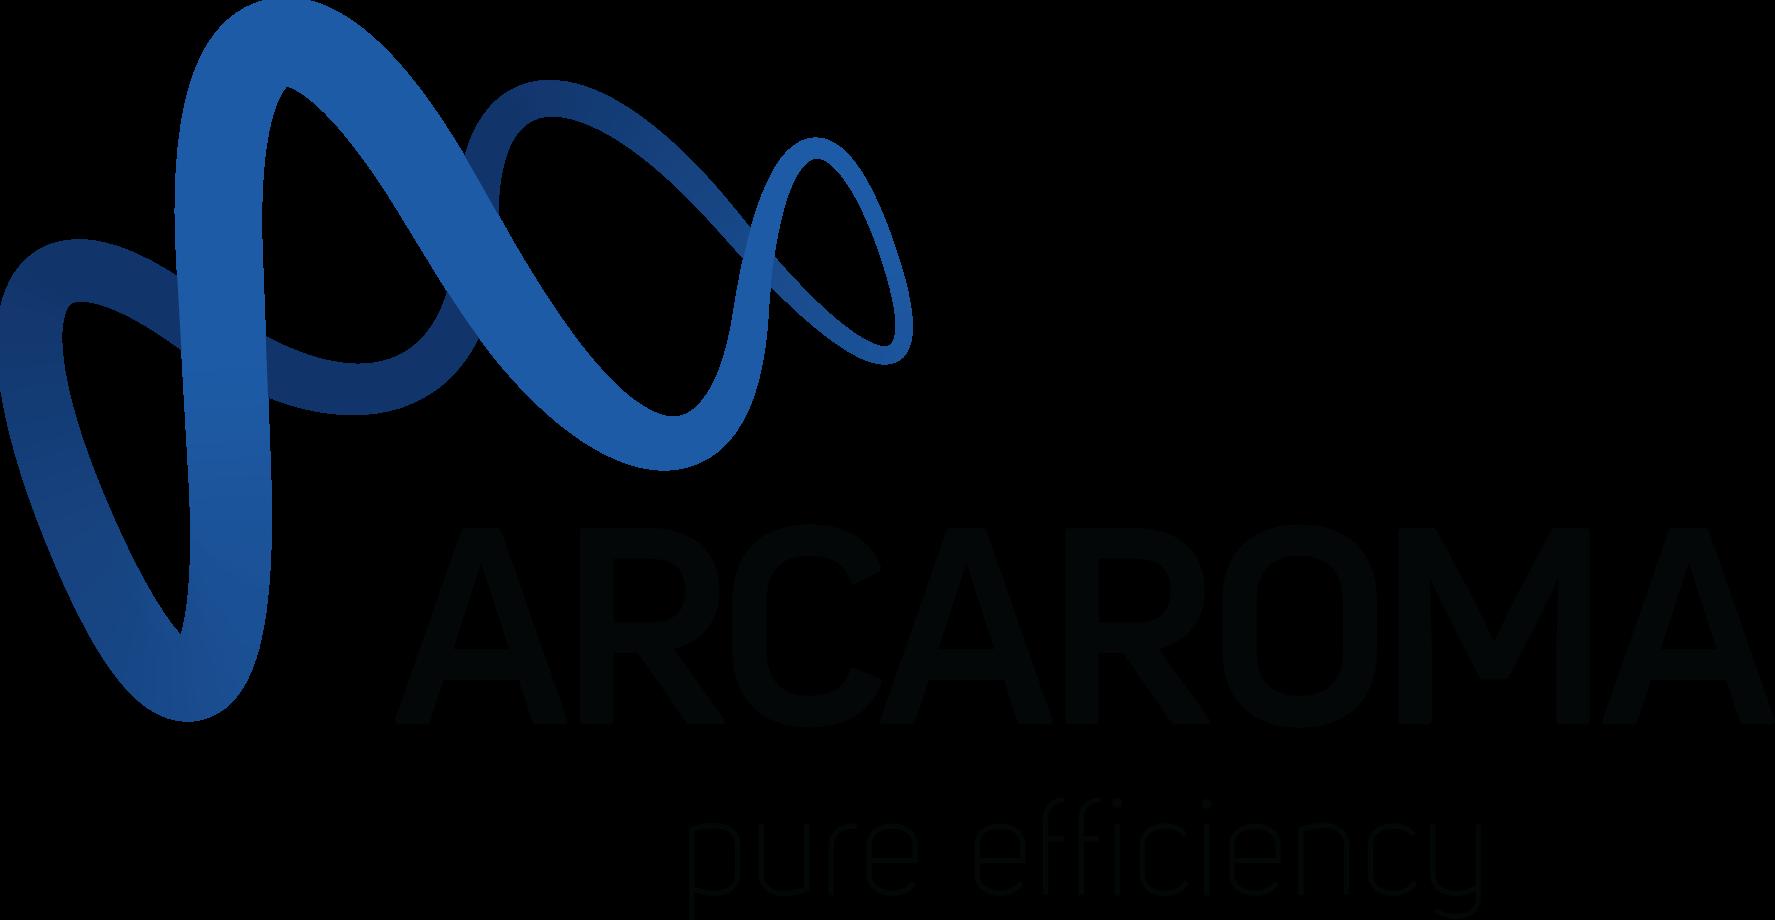 arcaroma logo